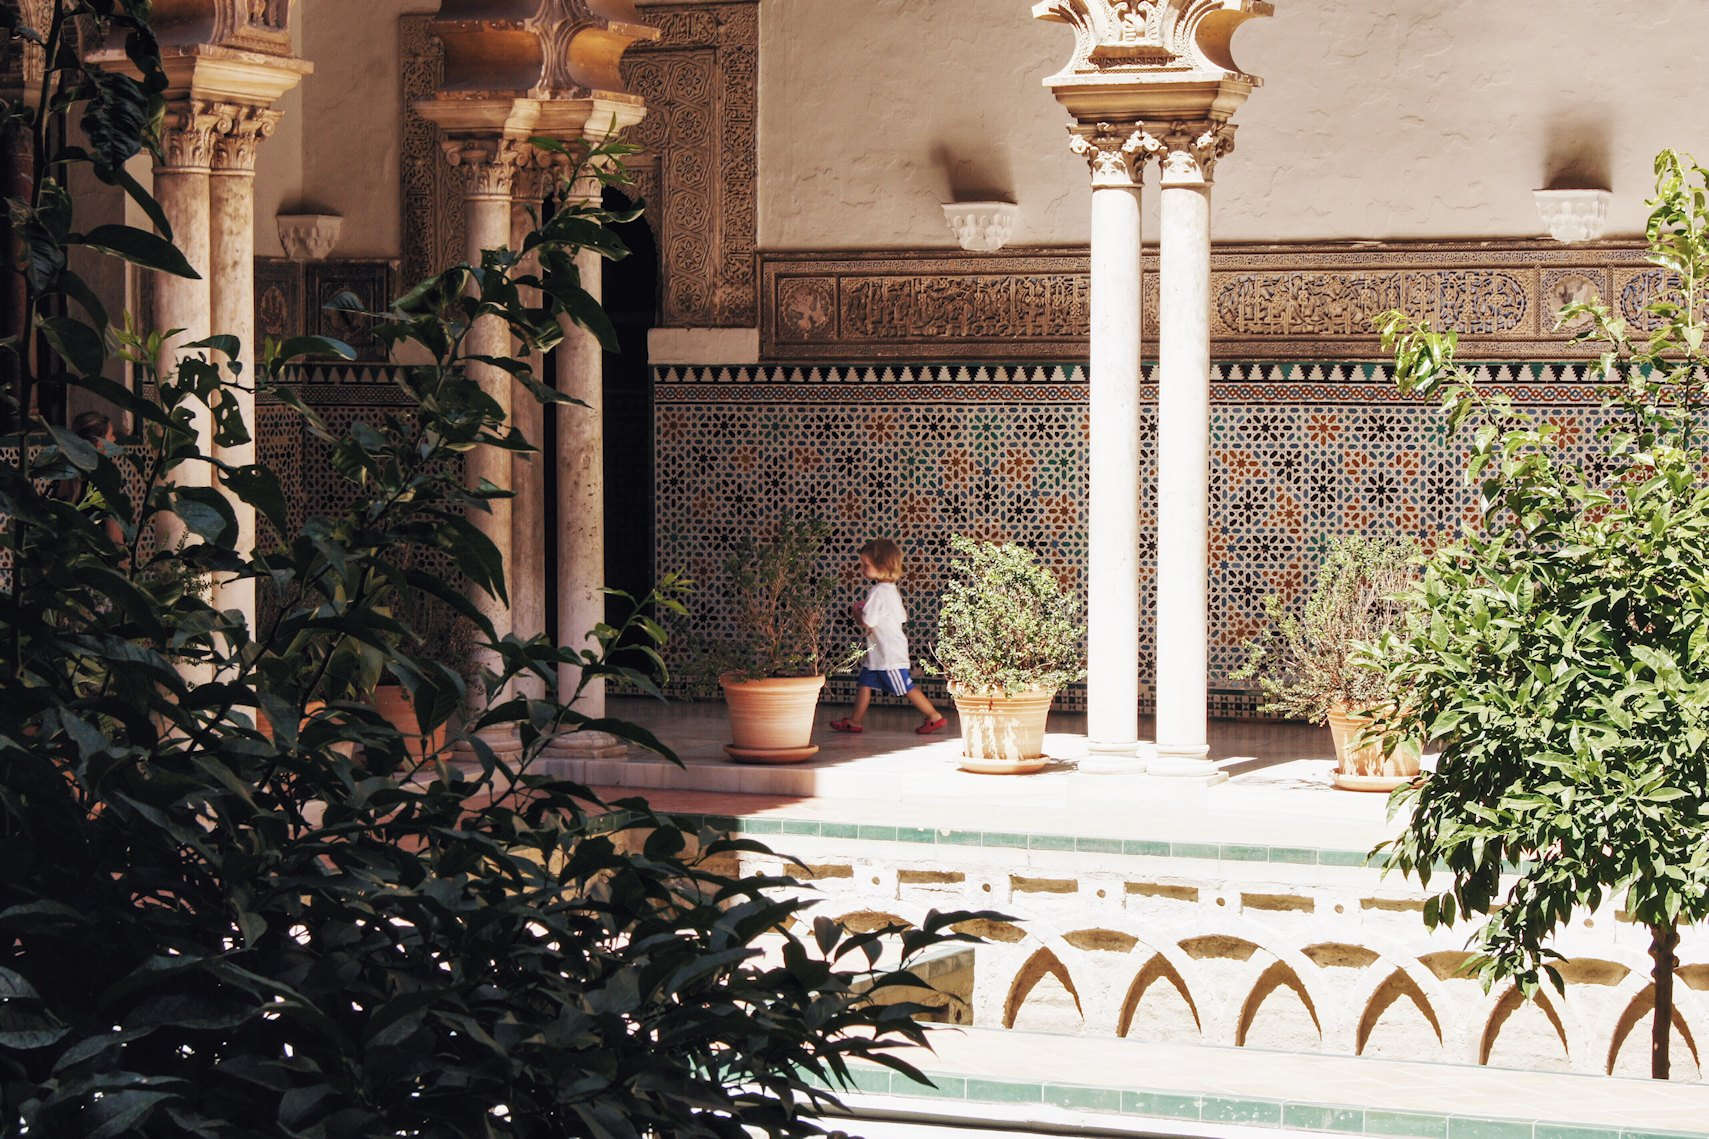 Hiszpania, Sewilla